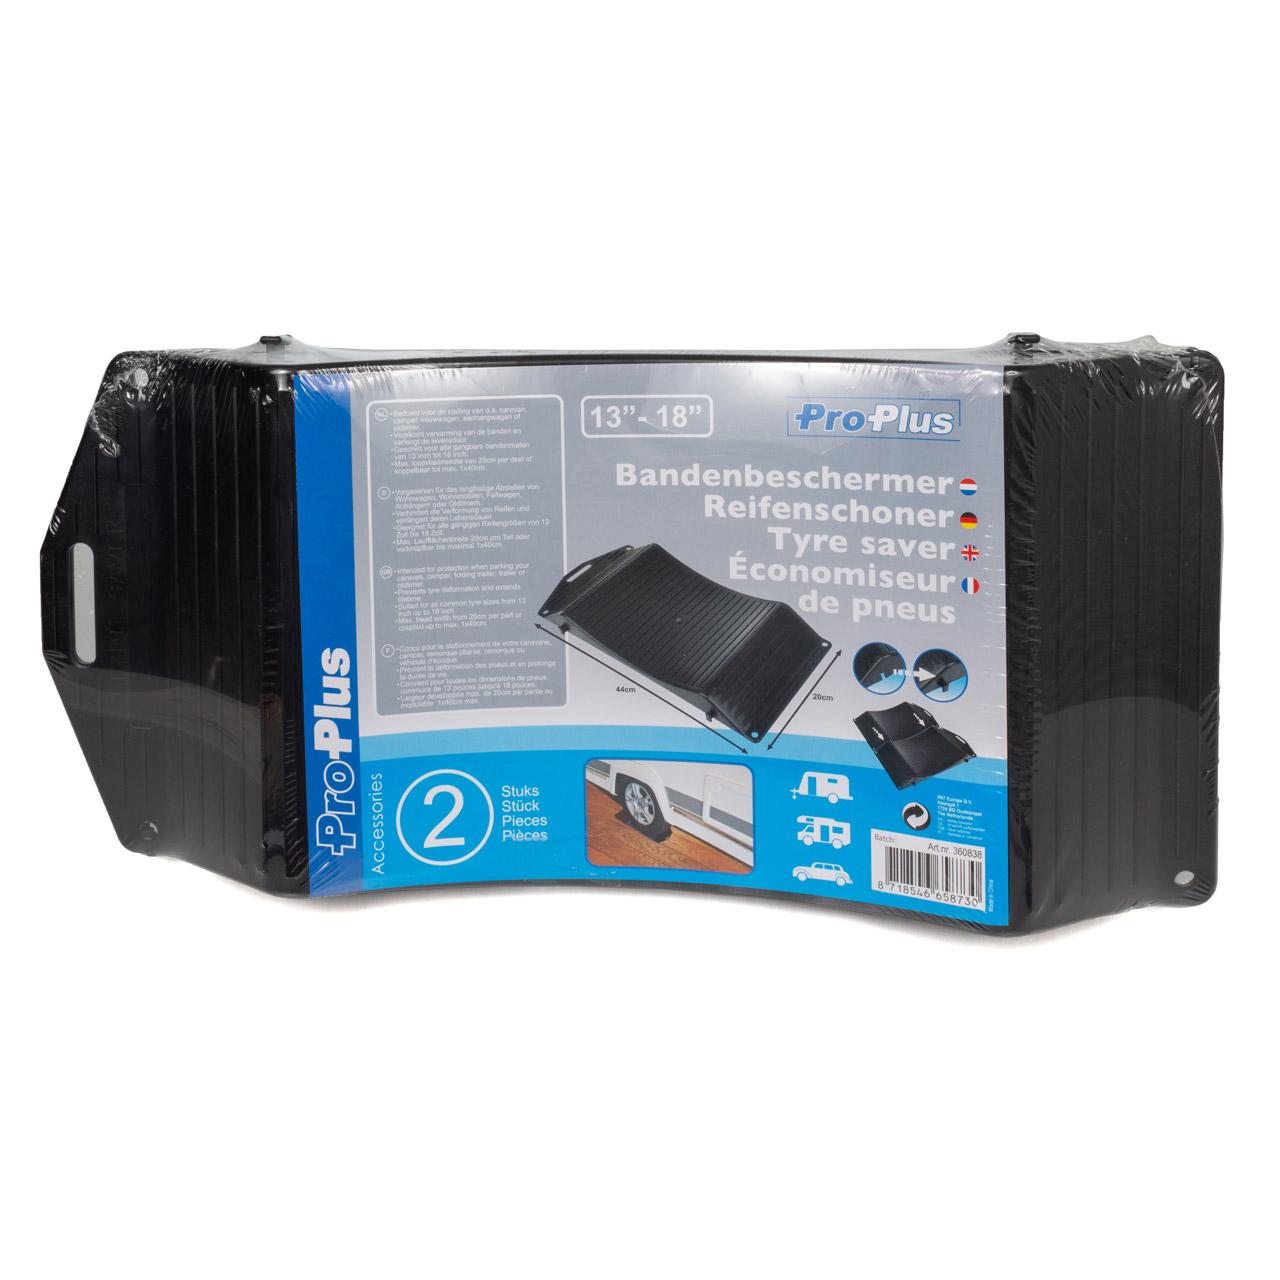 2x PROPLUS Reifenschoner Reifenwiege Standplatte Reifenschutz SCHWARZ 13-18 Zoll